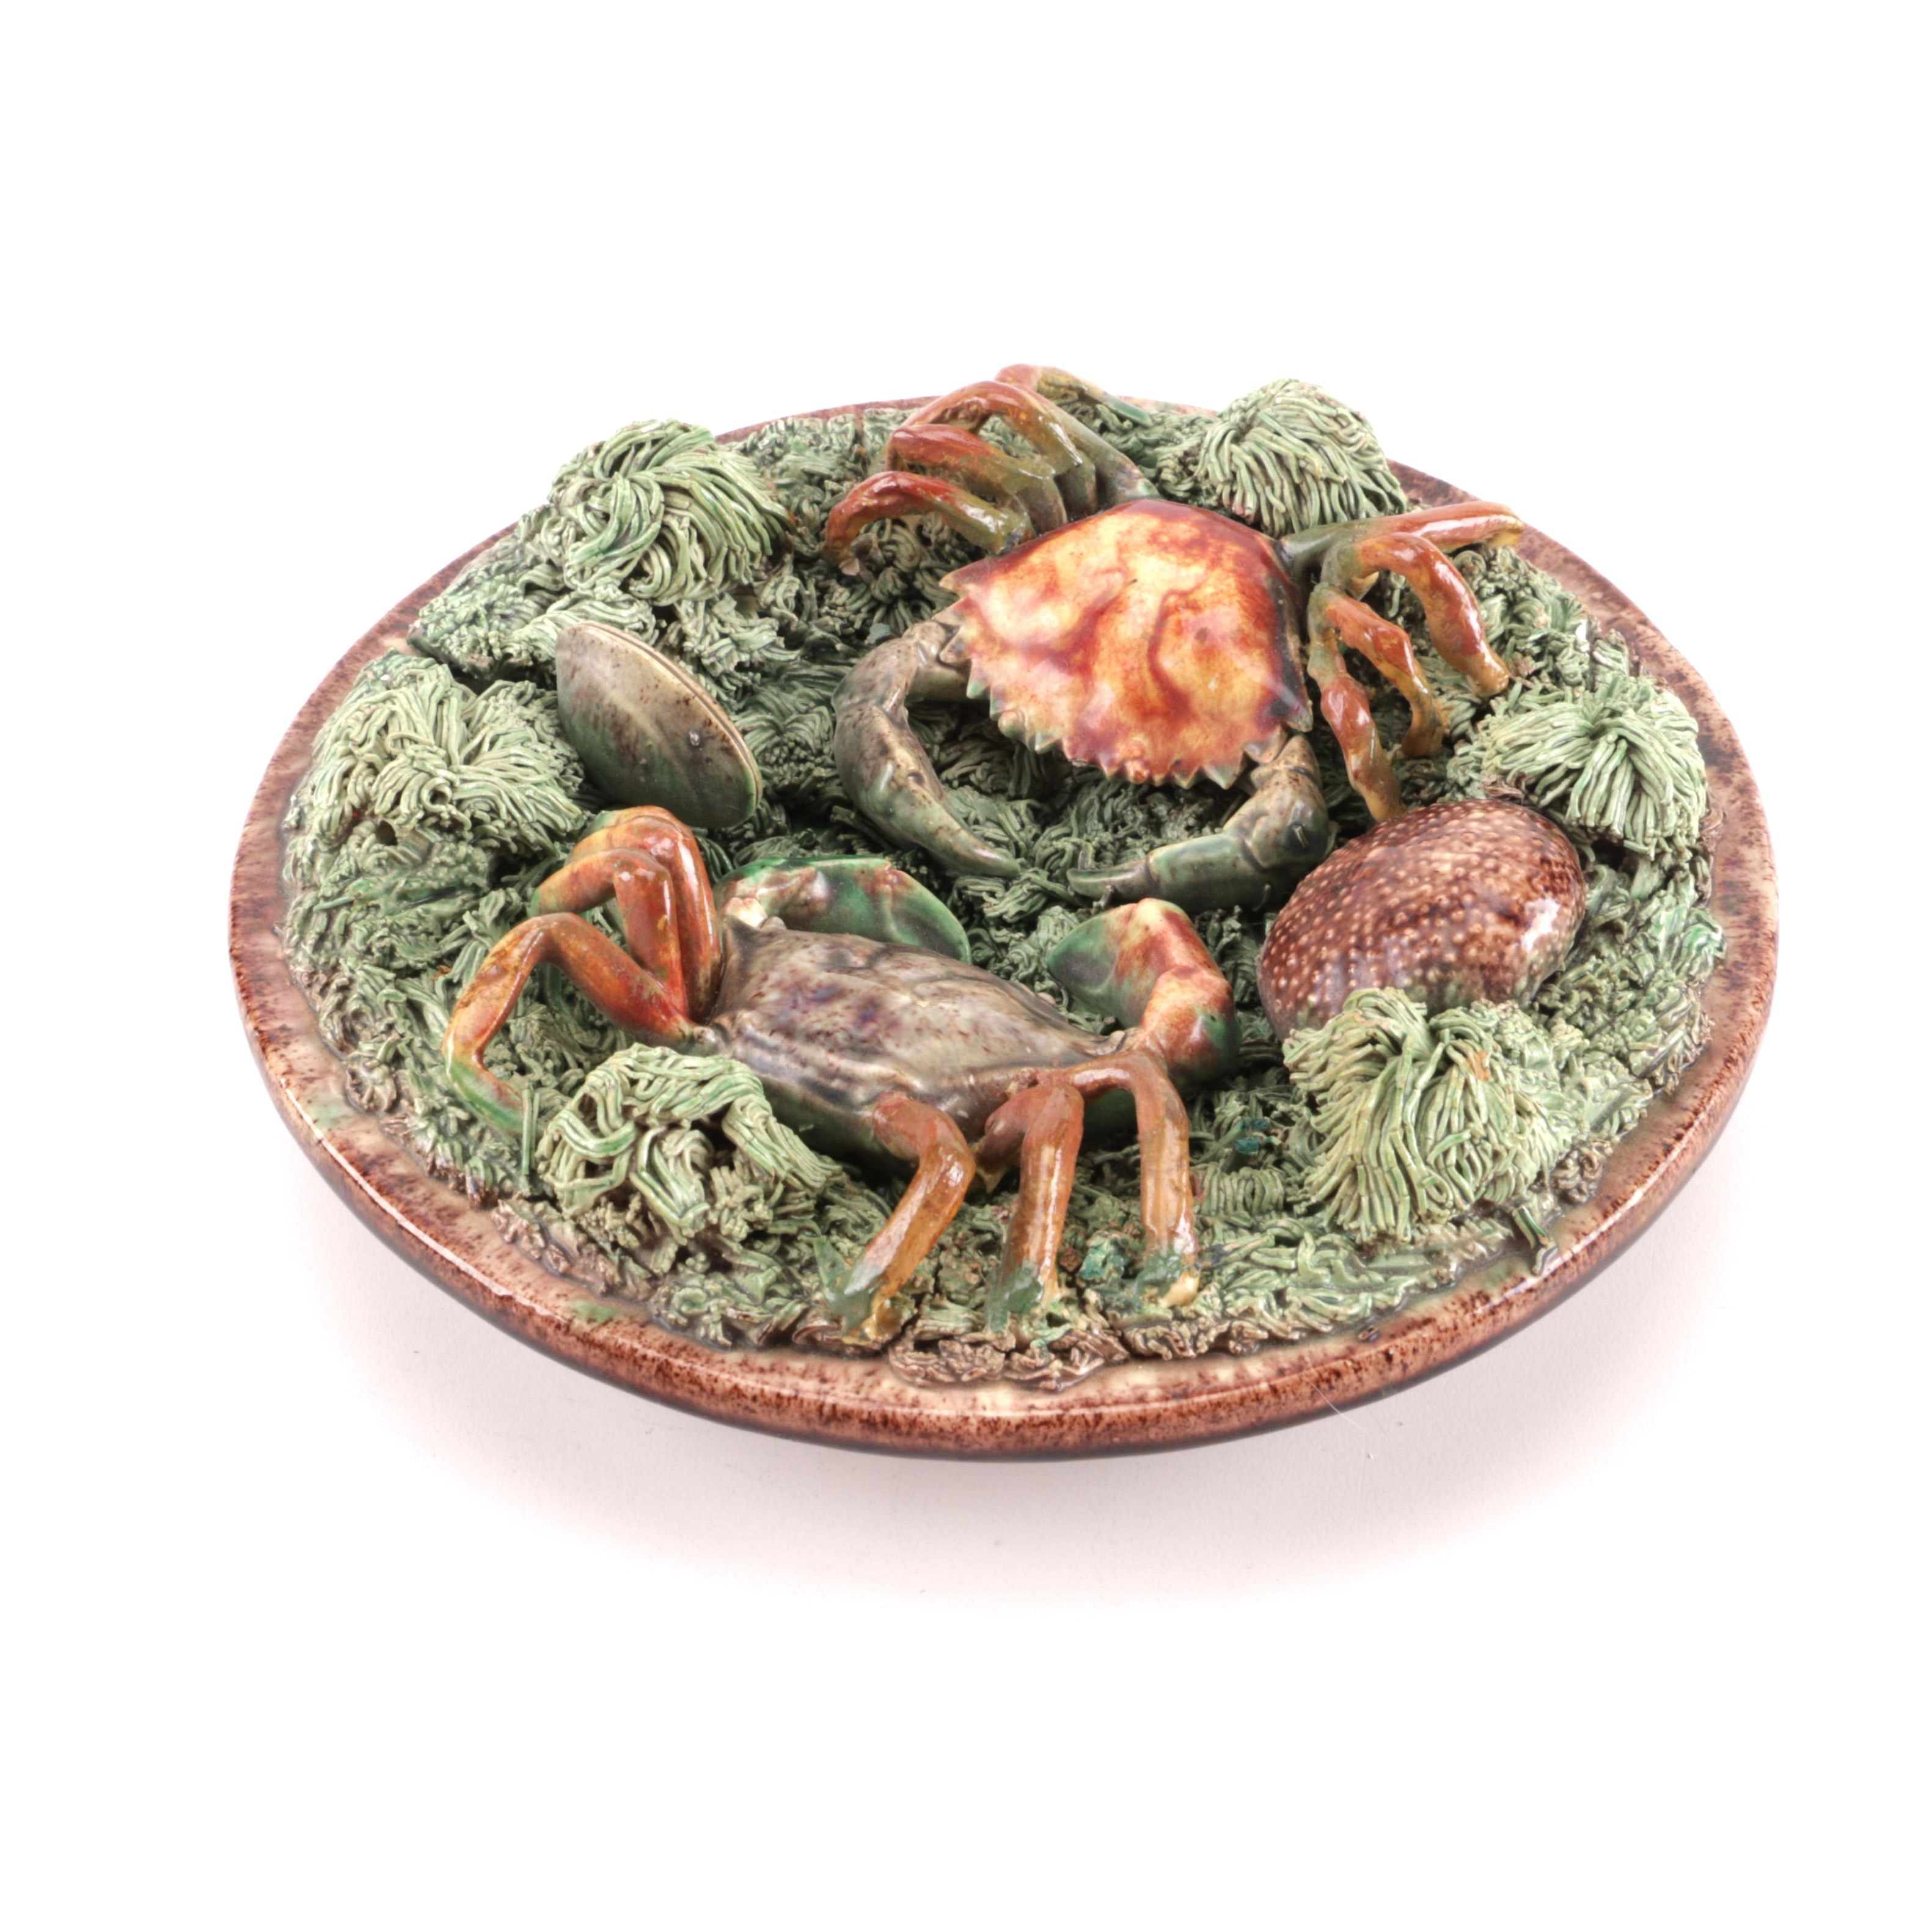 Manuel Mafra Decorative Majolica Ceramic Crab Plate